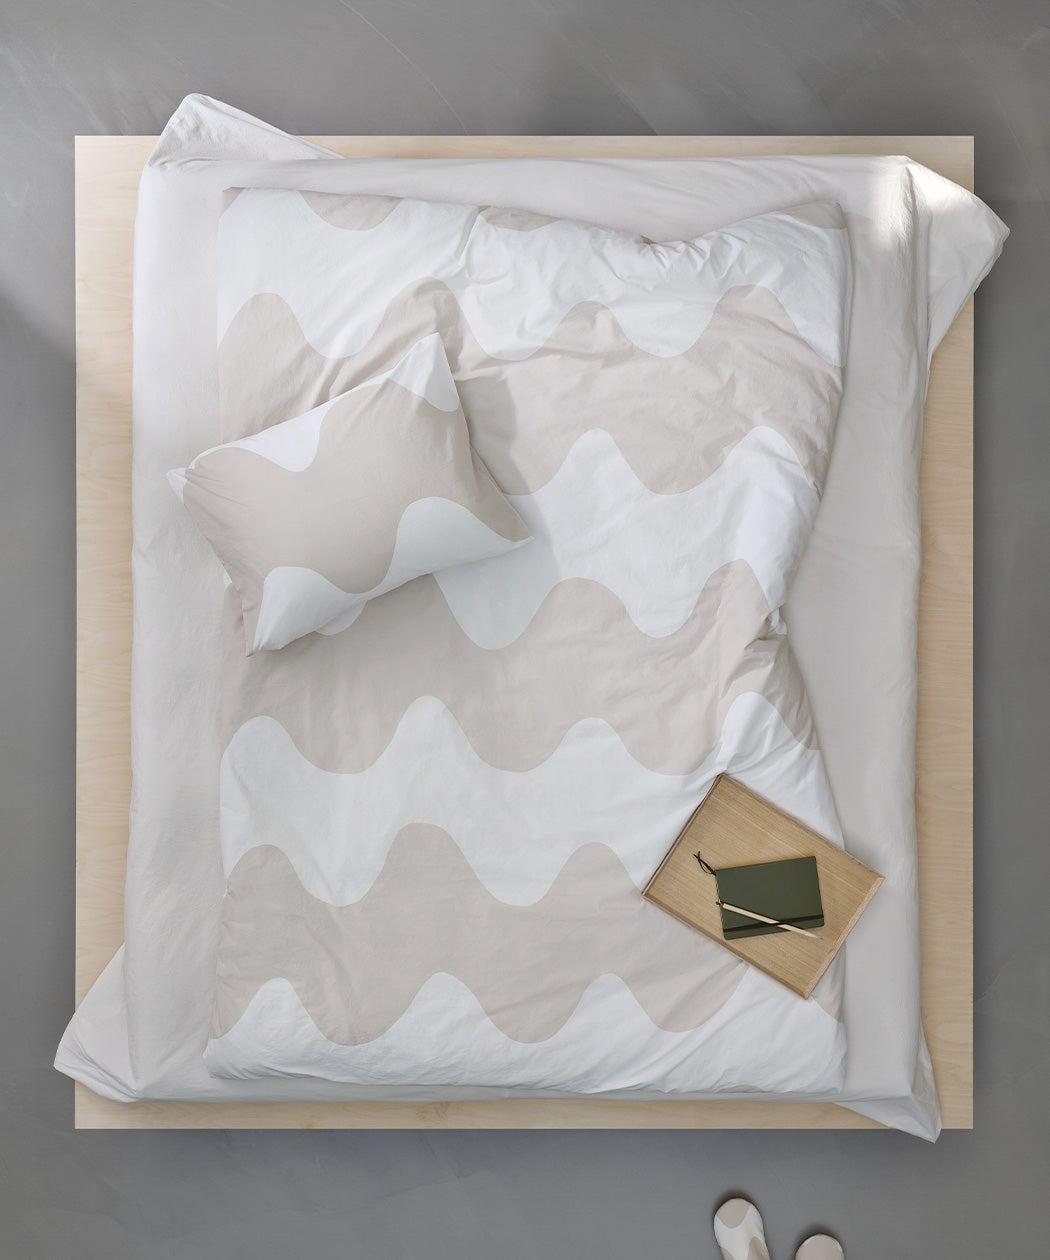 Marimekko Lokki bed linen